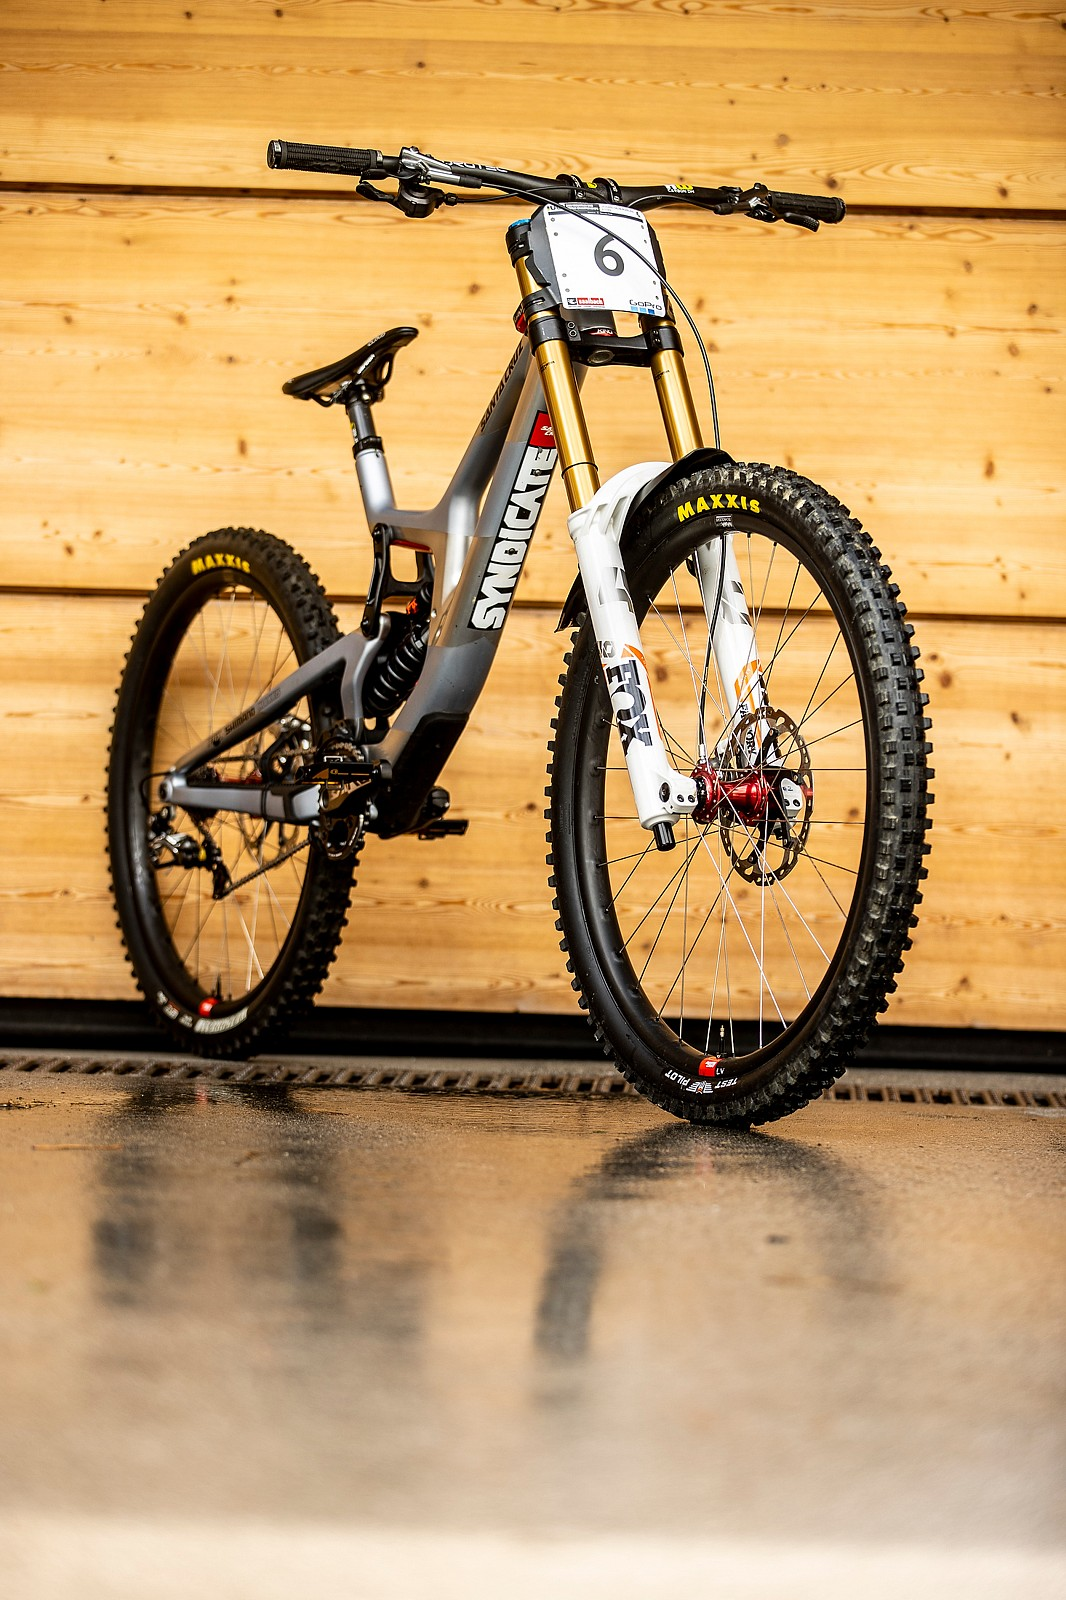 So Rad - WORLD CHAMPS BIKE - Loris Vergier's and Luca Shaw's Santa Cruz V10 - Mountain Biking Pictures - Vital MTB